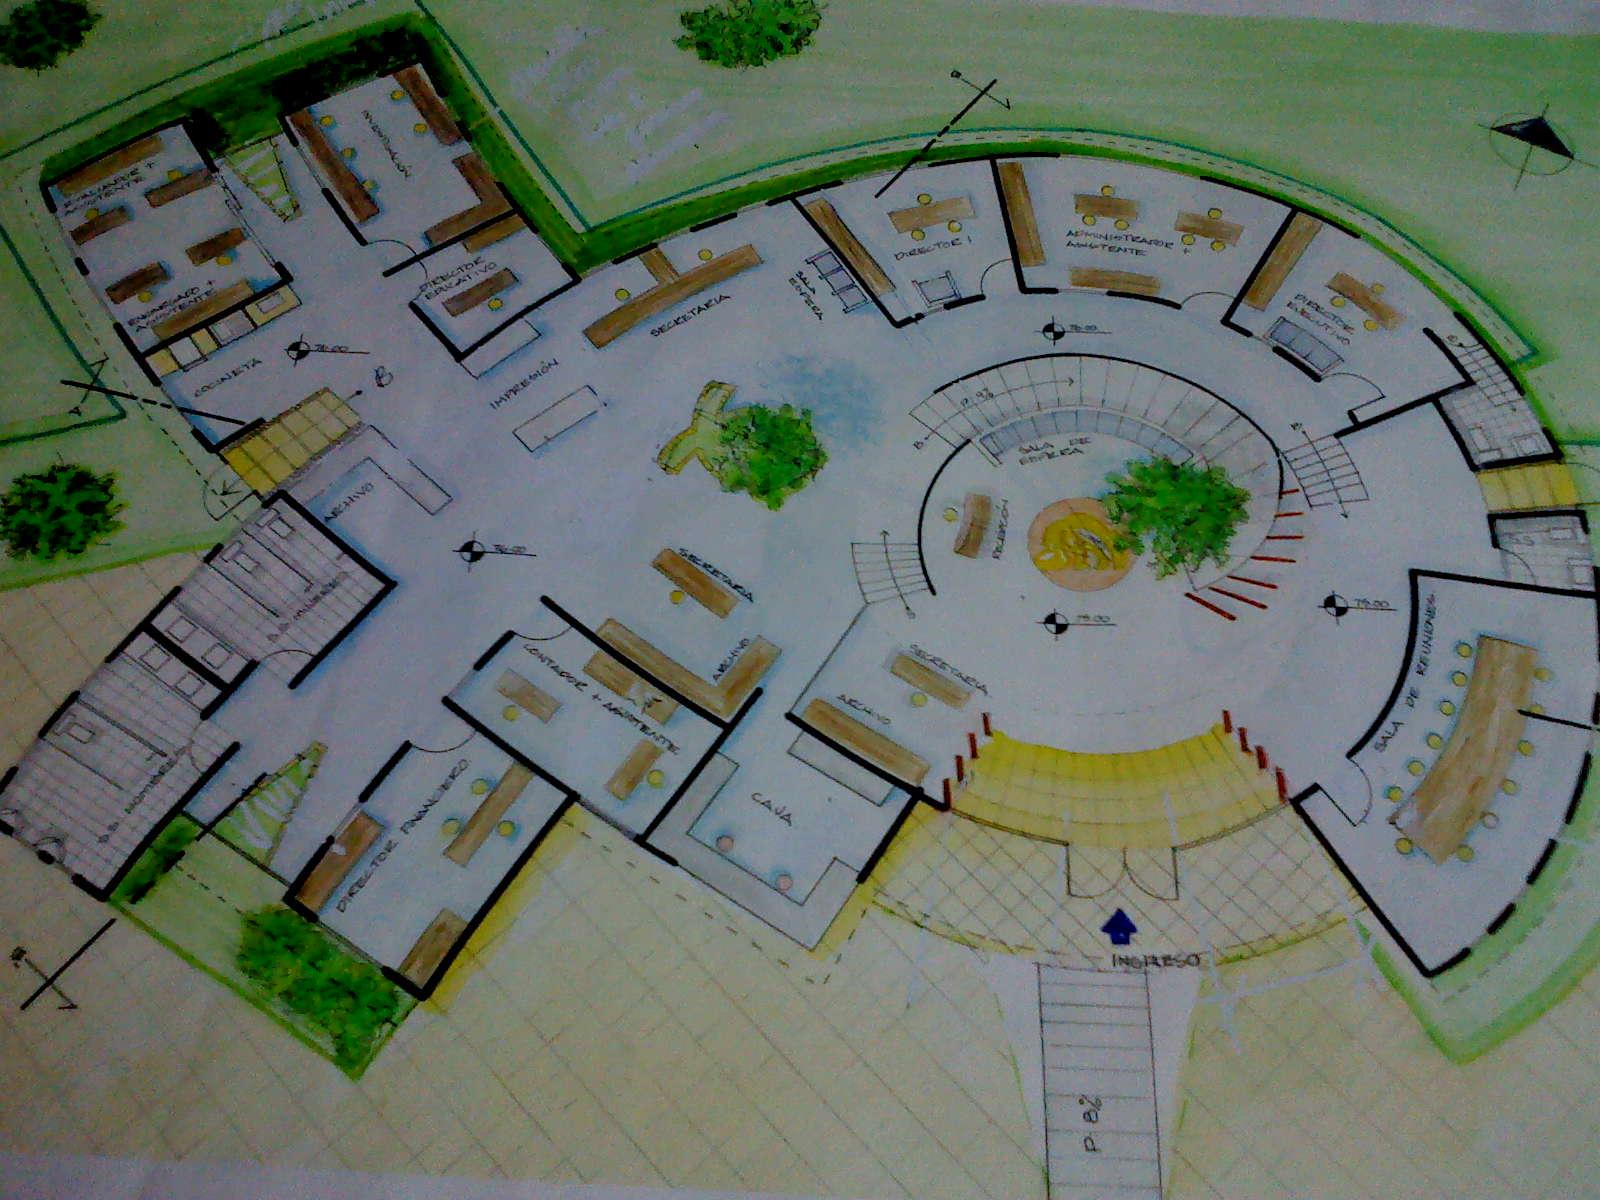 Dise o arquitectonico 3 for Diseno de oficinas administrativas